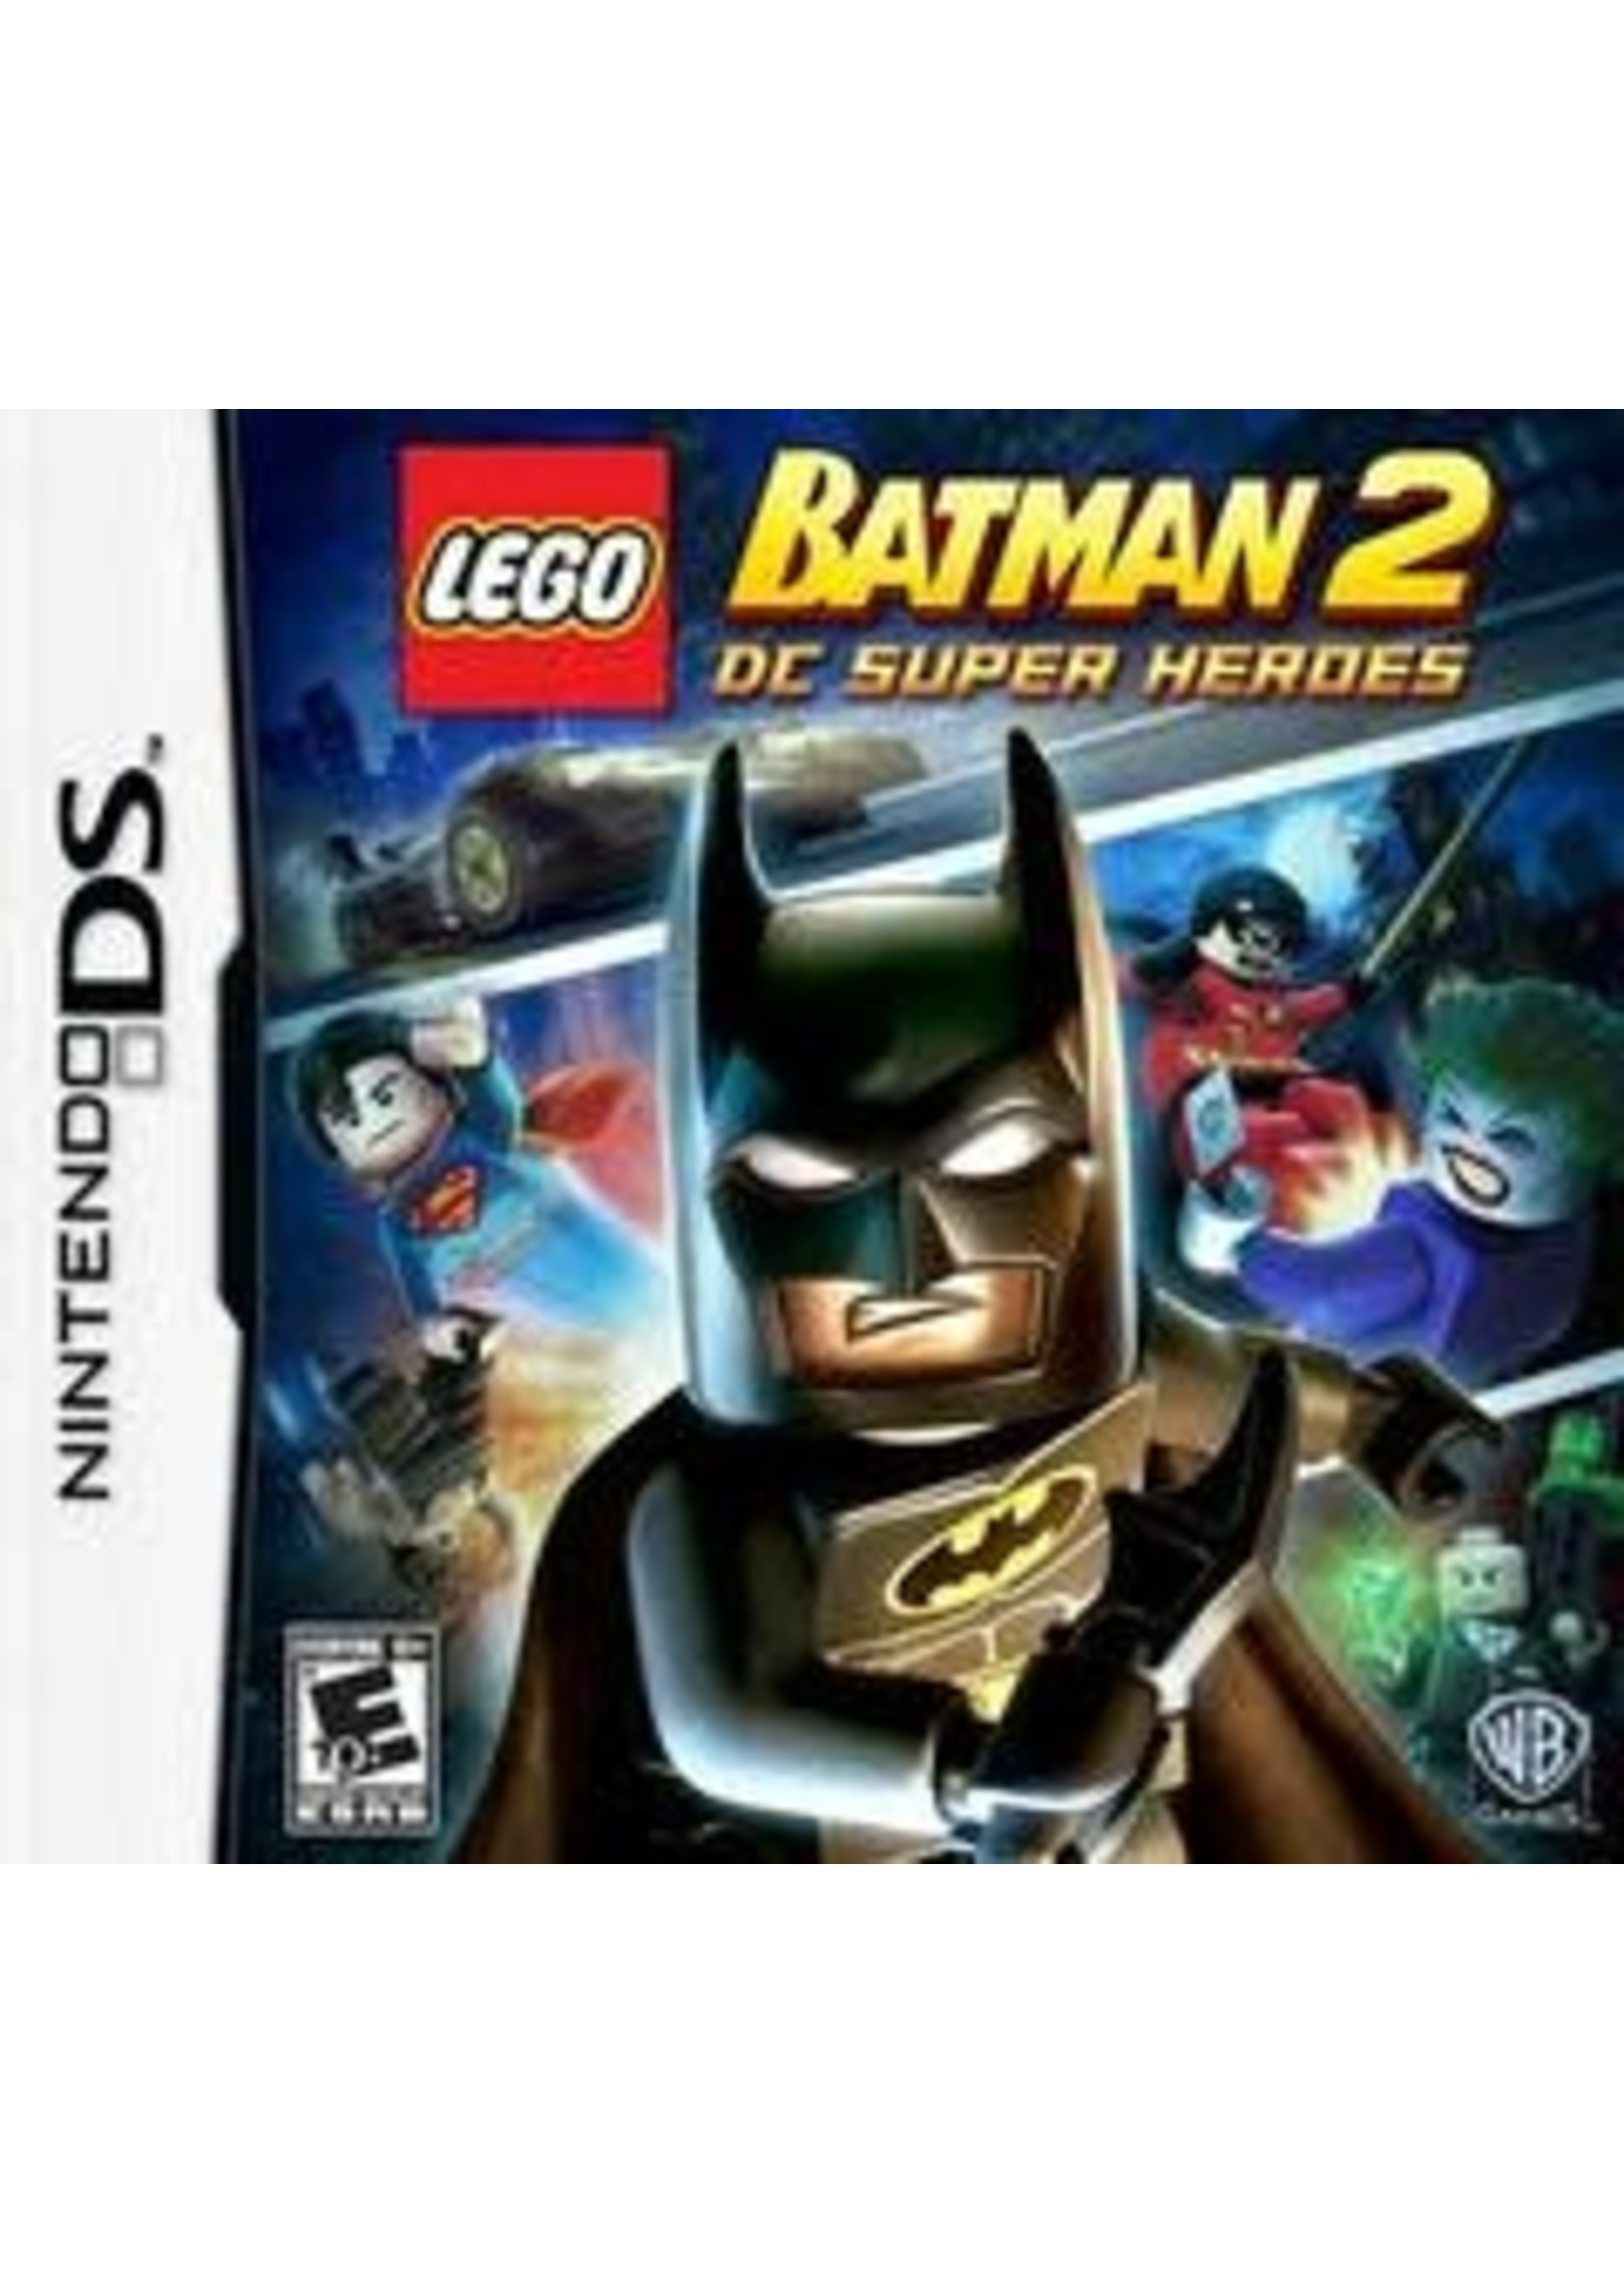 LEGO Batman 2 Nintendo DS